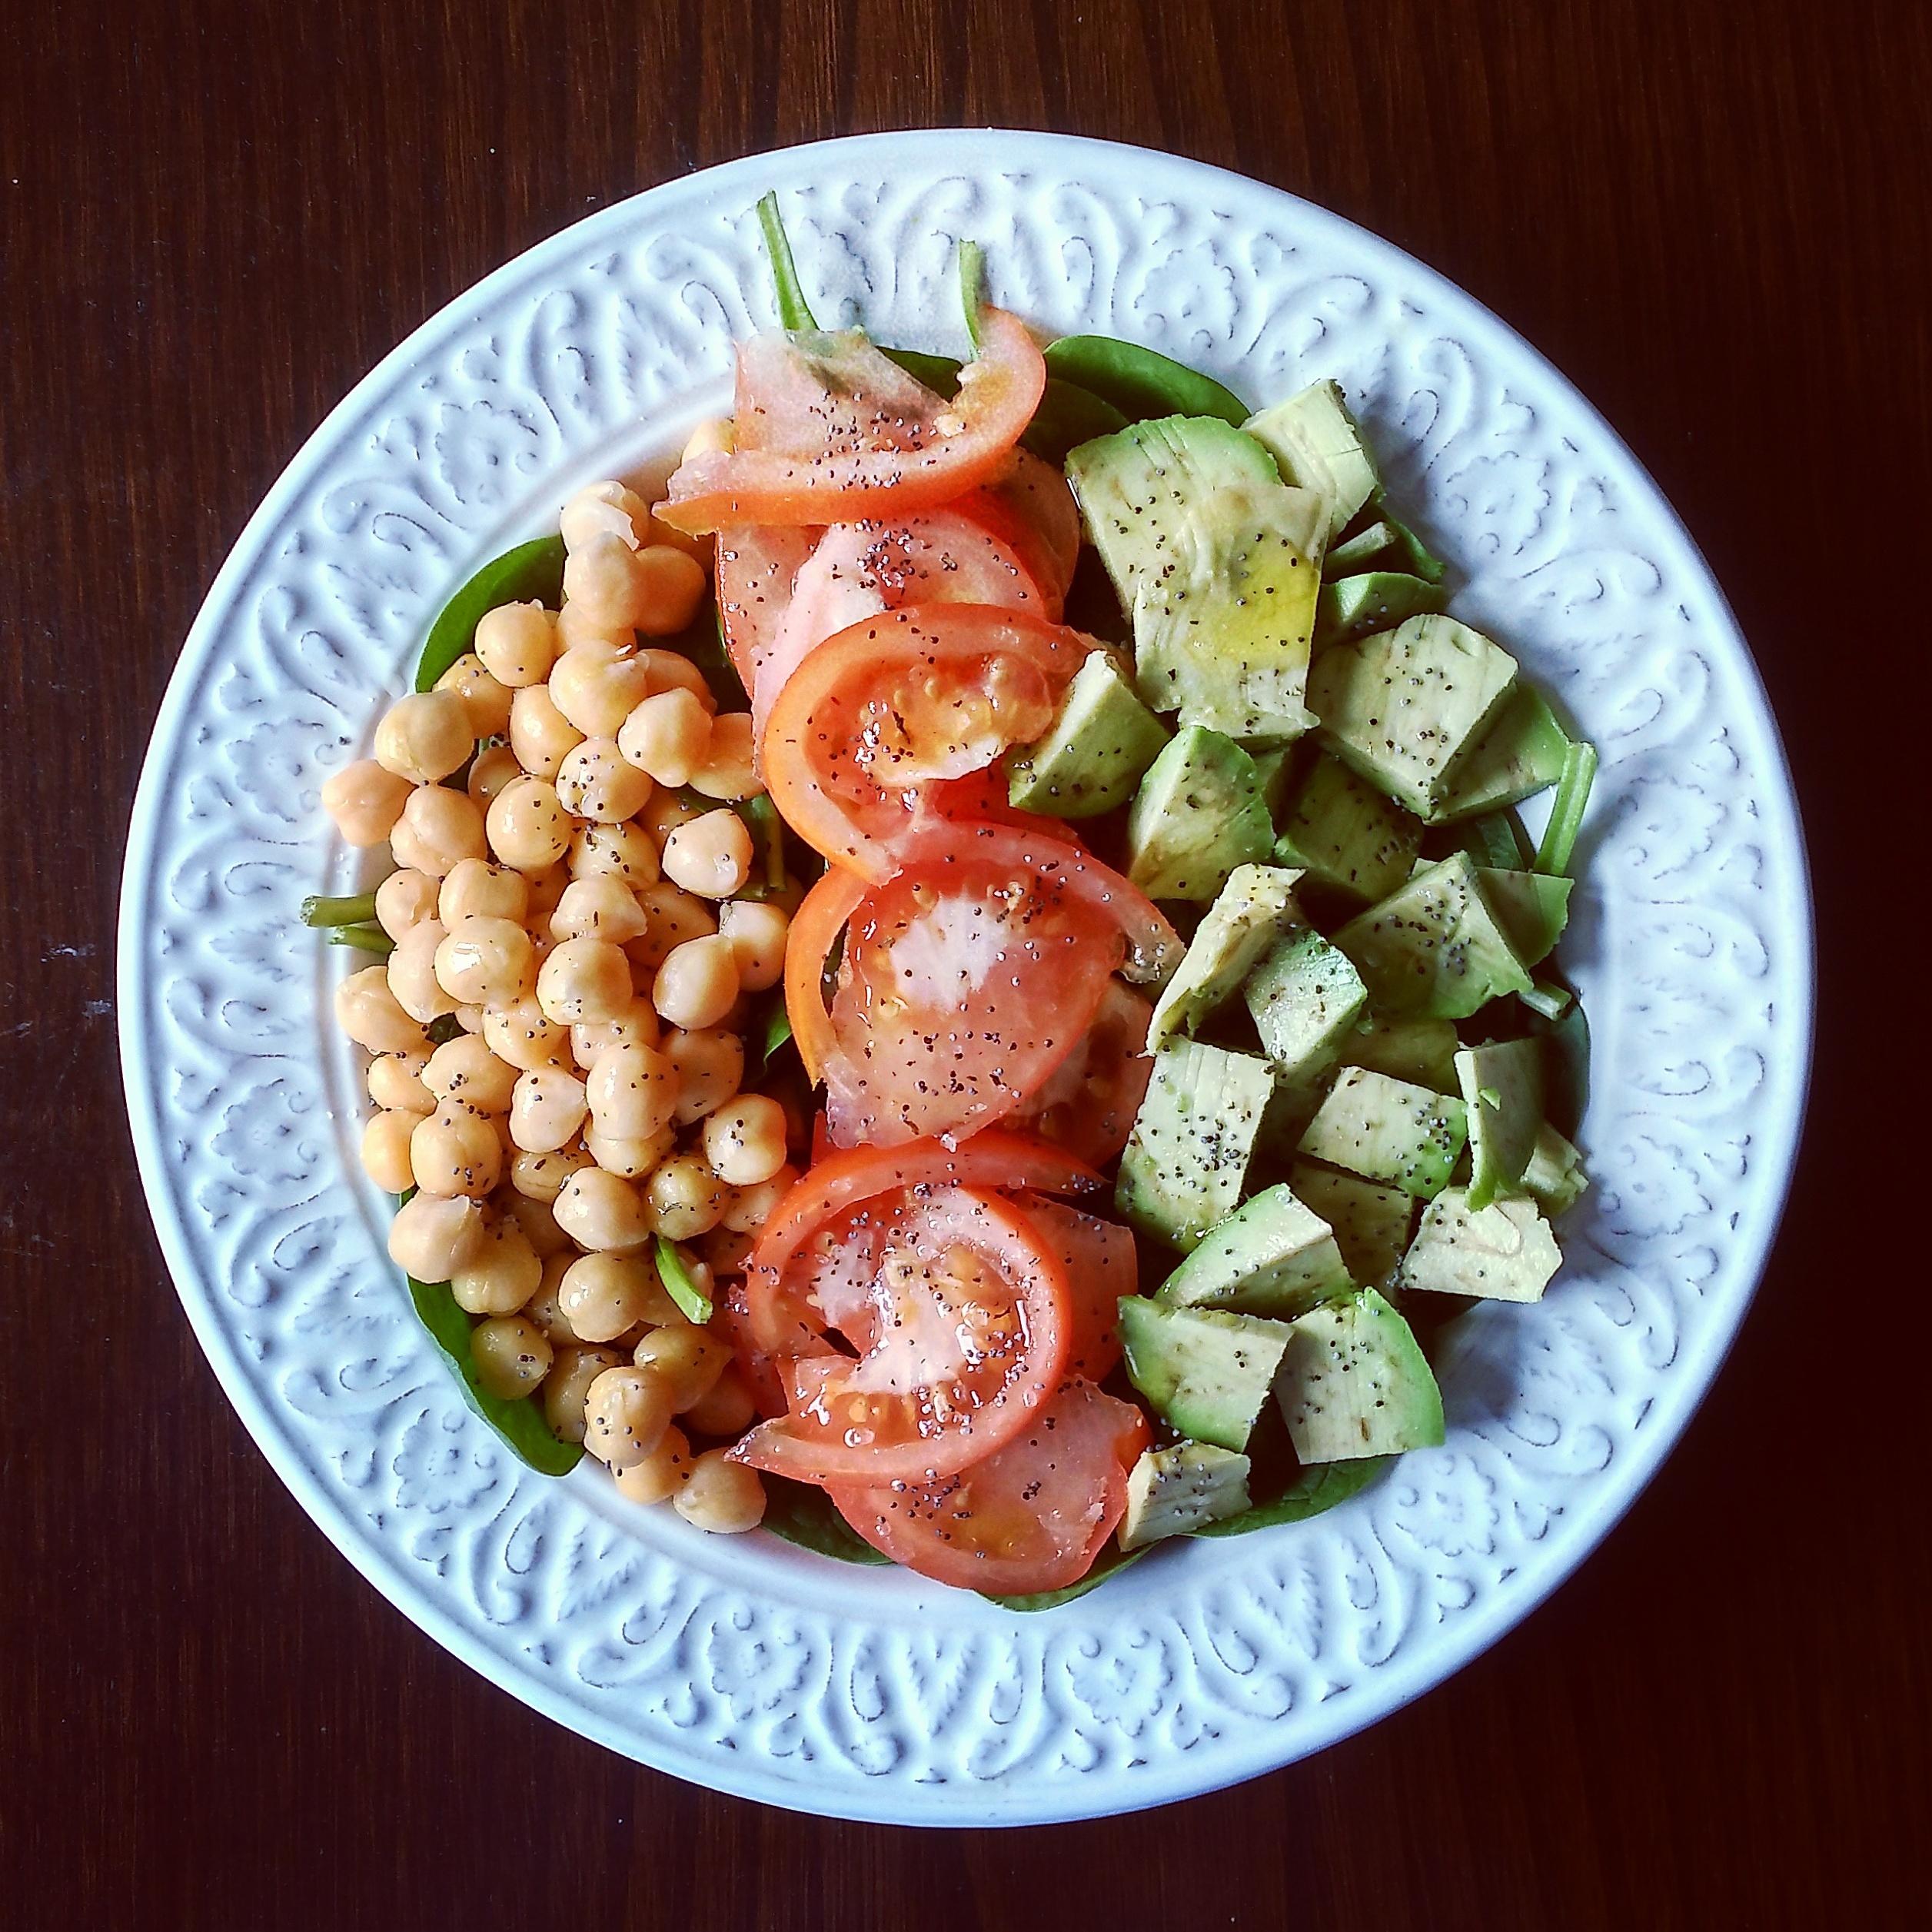 Ensalada con garbanzos tomate y aguacate mar a p rez mu oz - Ensalada de garbanzos light ...